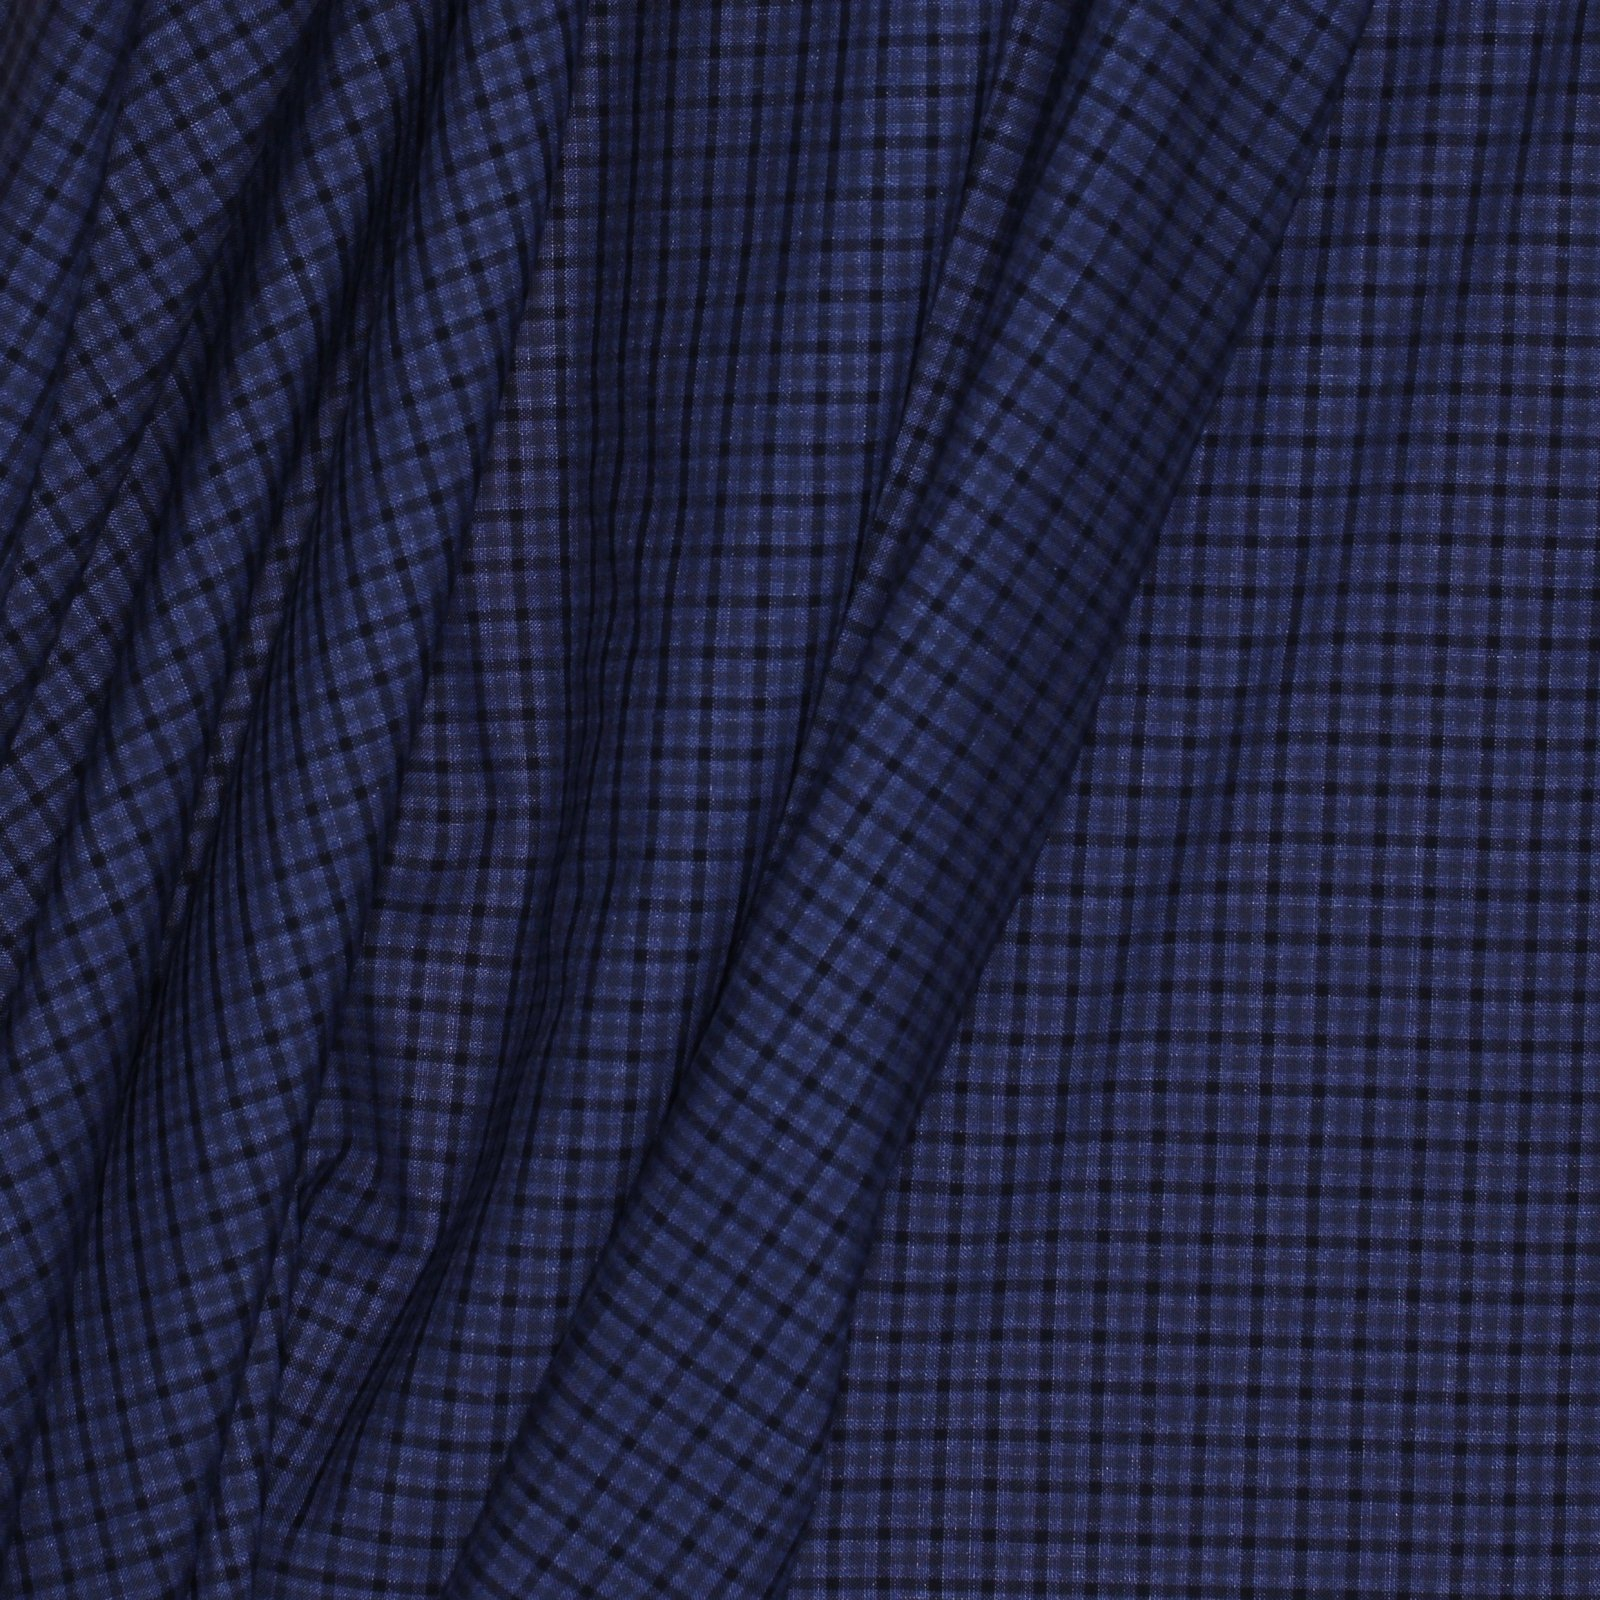 Violet/Black Small Check Italian Silk/Linen